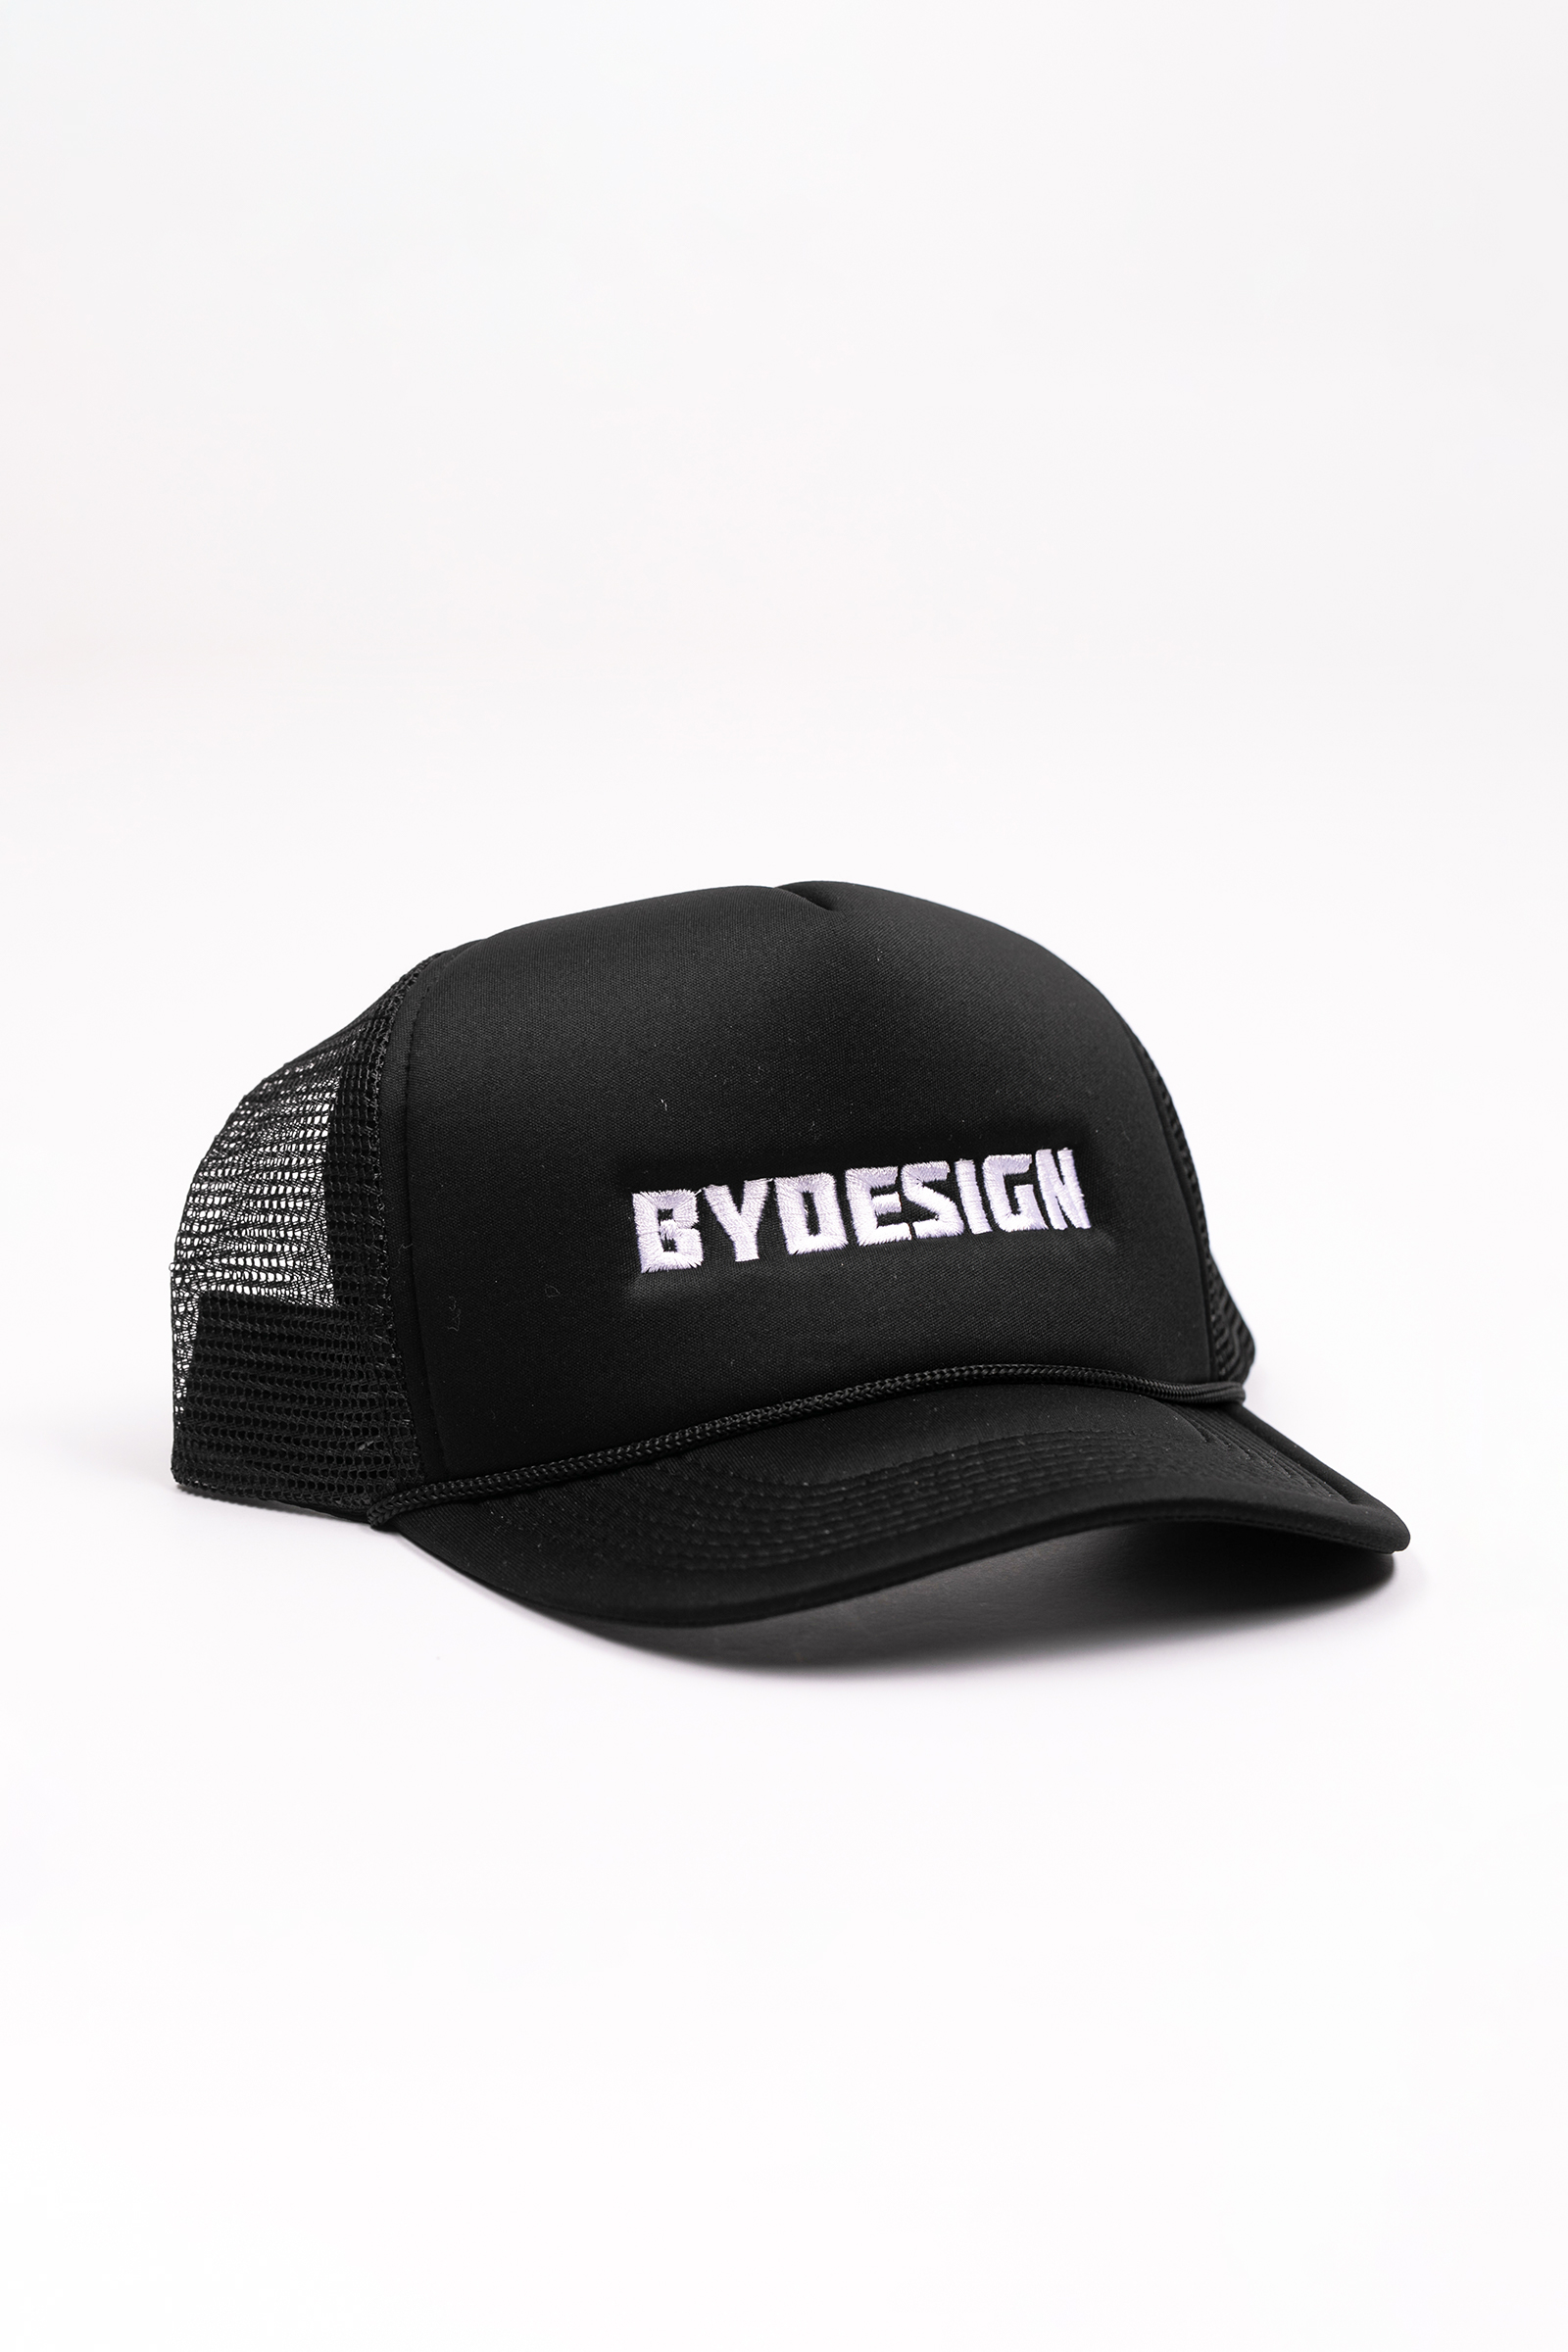 By Design Logo Trucker Hat - Black